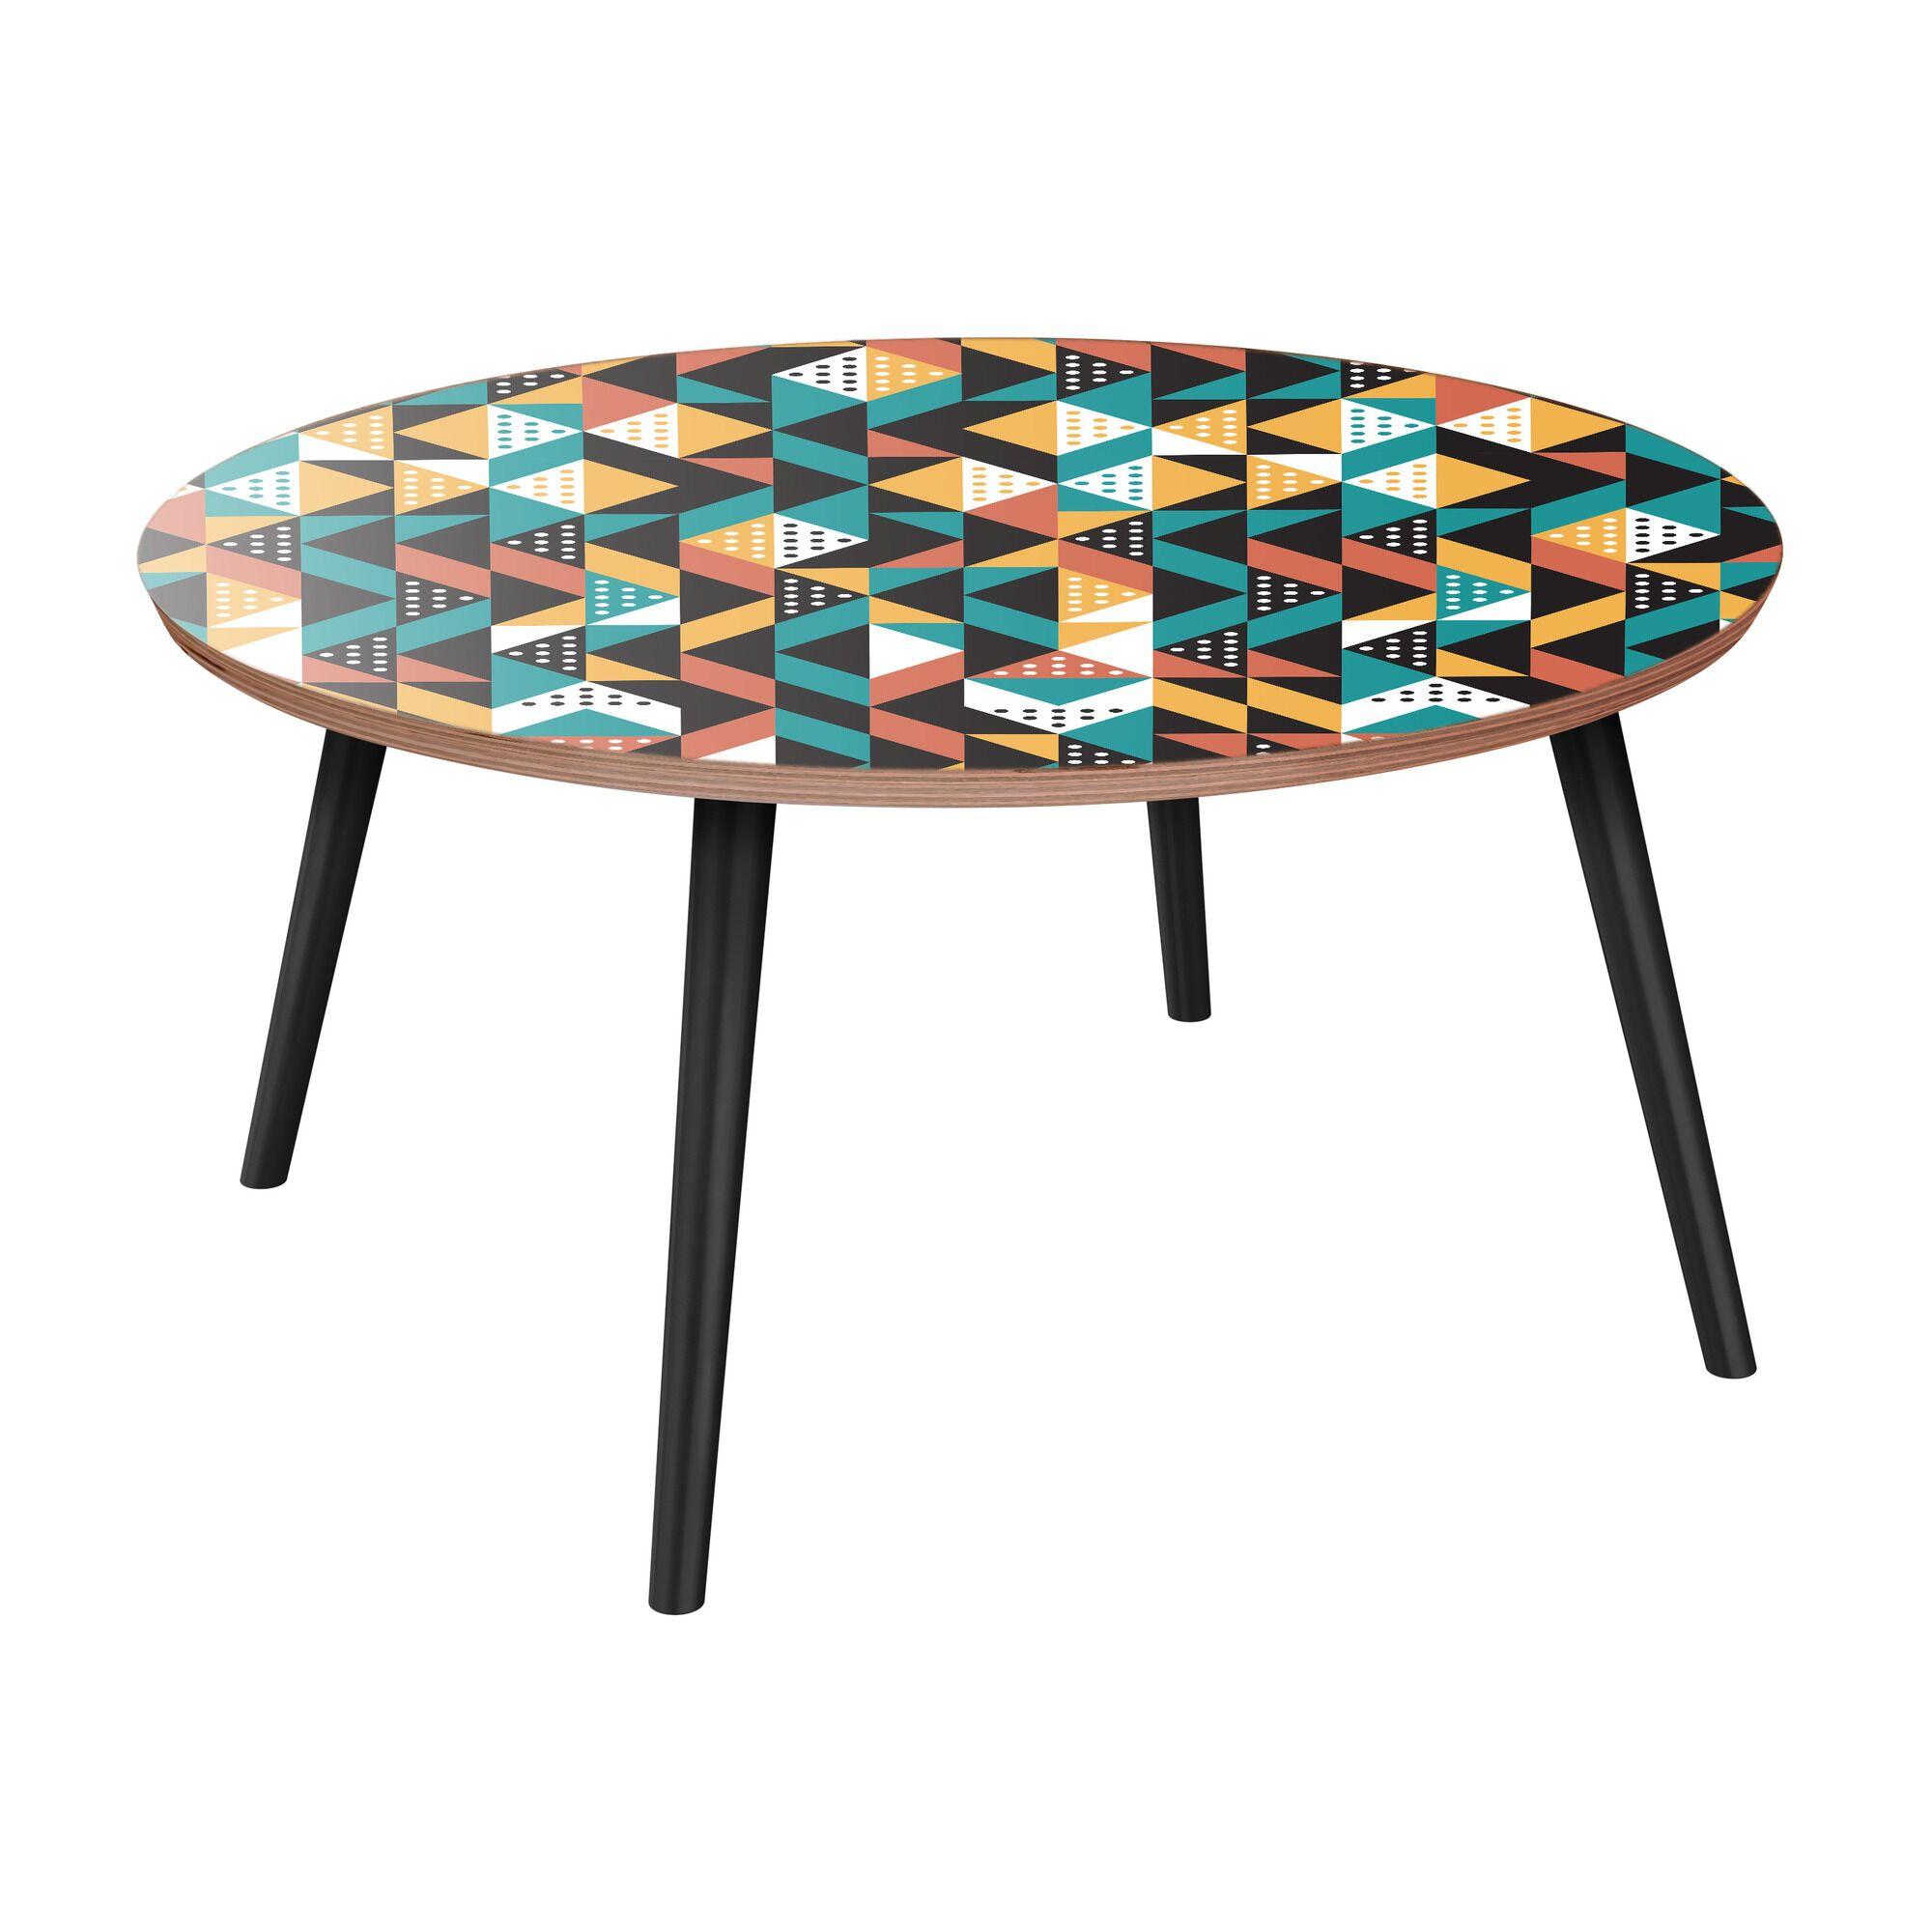 Appalachian Coffee Table Table Top Color: Walnut, Table Base Color: Black